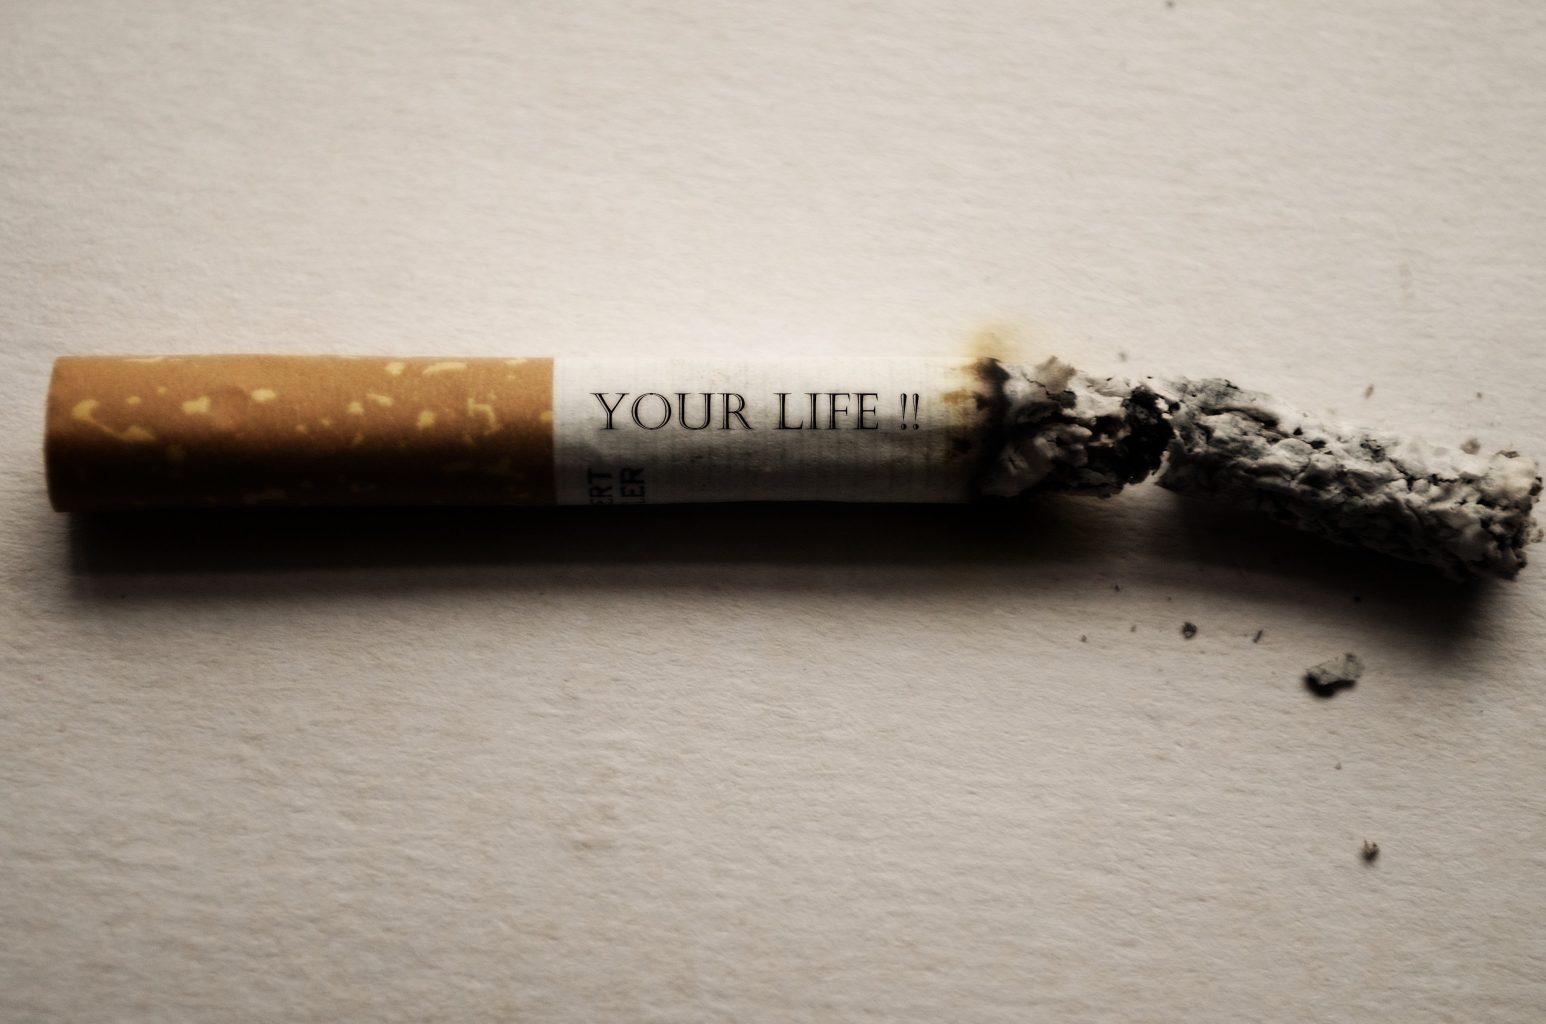 arret-tabac-bordeaux-france